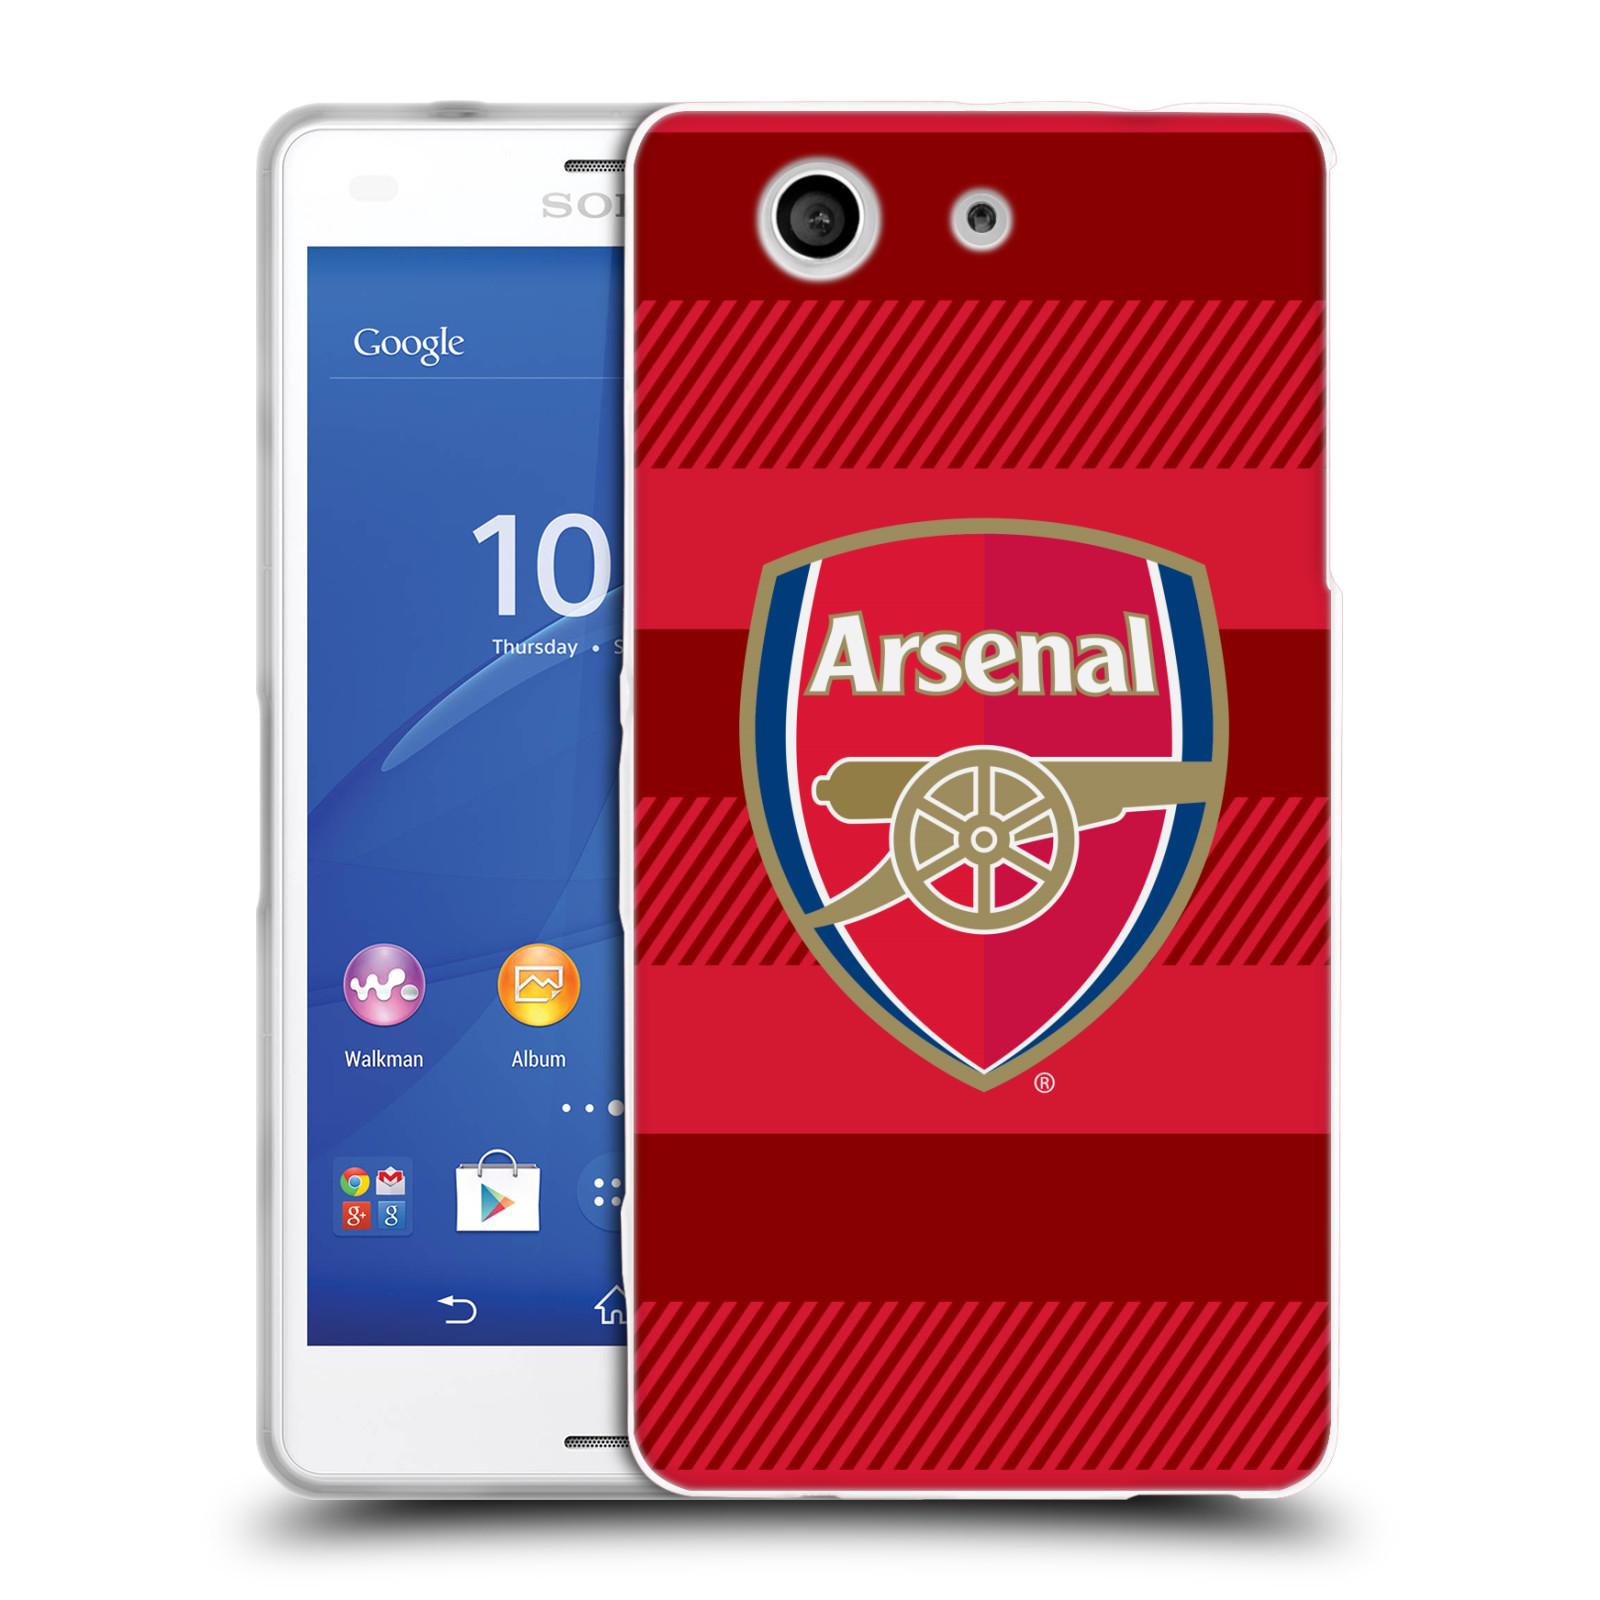 Silikonové pouzdro na mobil Sony Xperia Z3 Compact D5803 - Head Case - Arsenal FC - Logo s pruhy